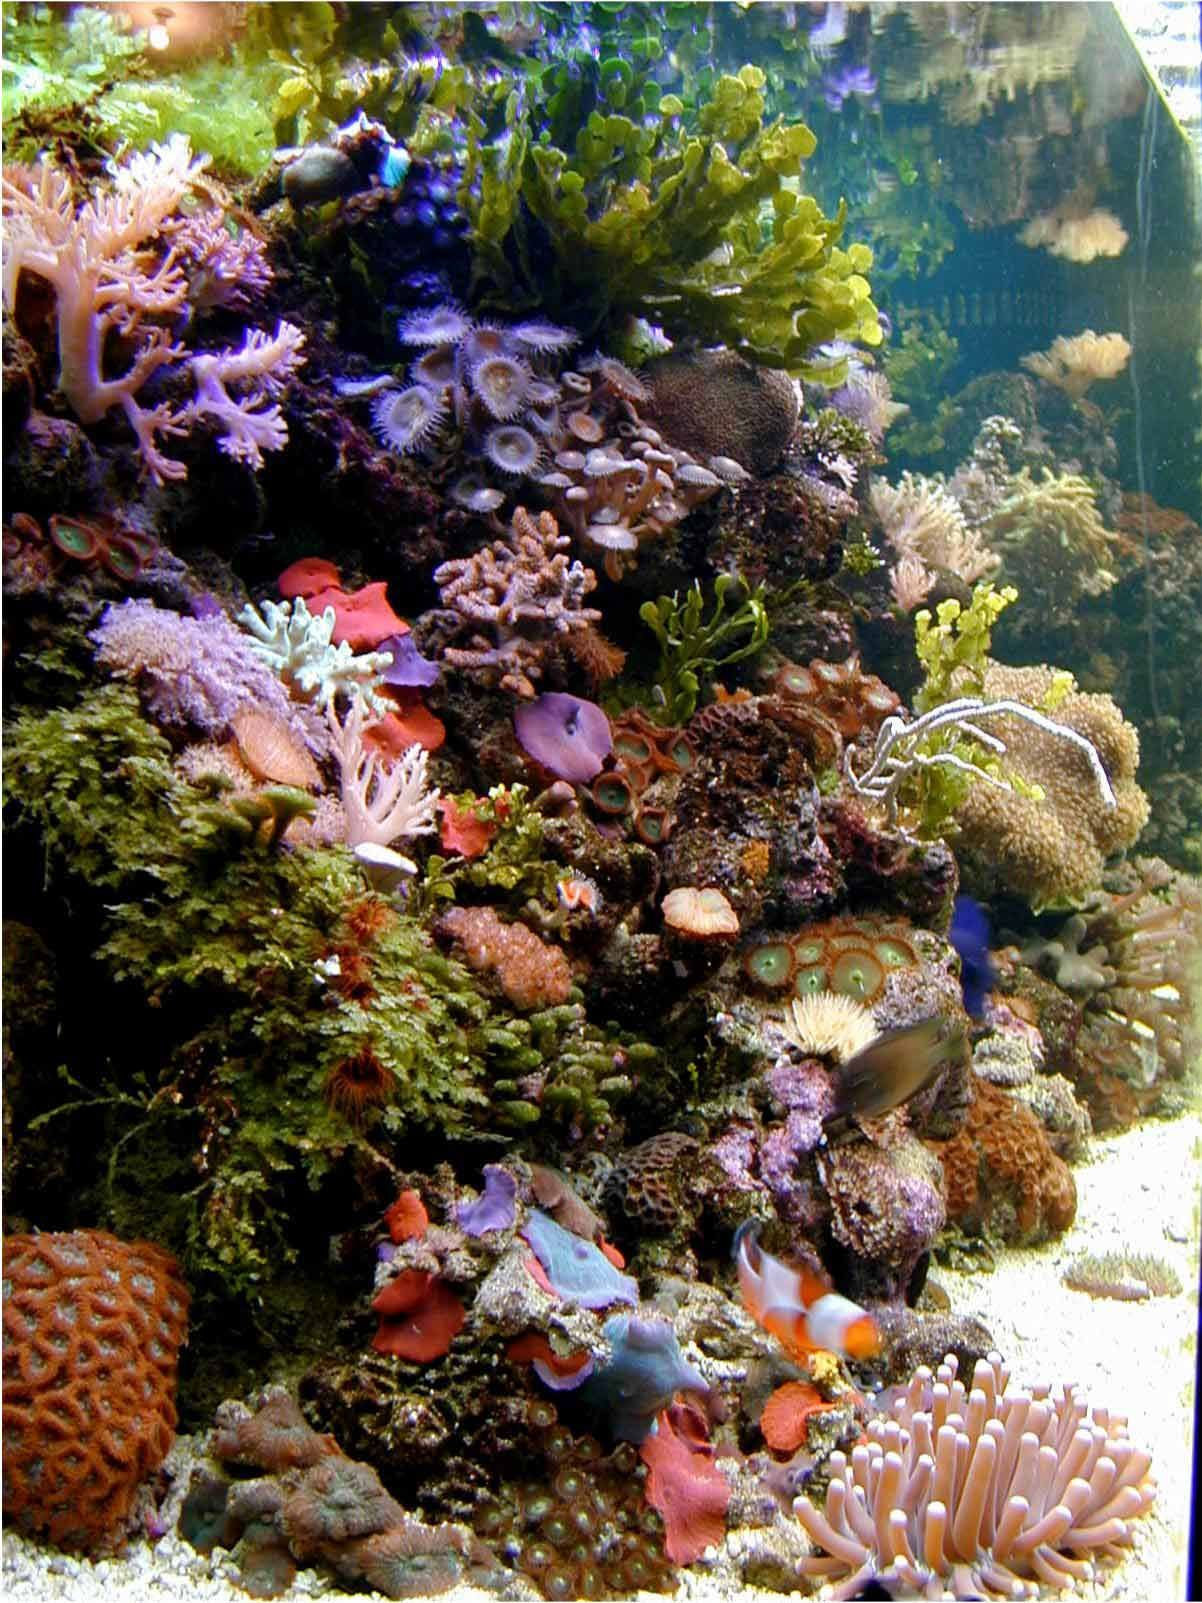 244d3512465f01ffa8fbef1bde45662c Luxe De Crevette Aquarium Des Idées